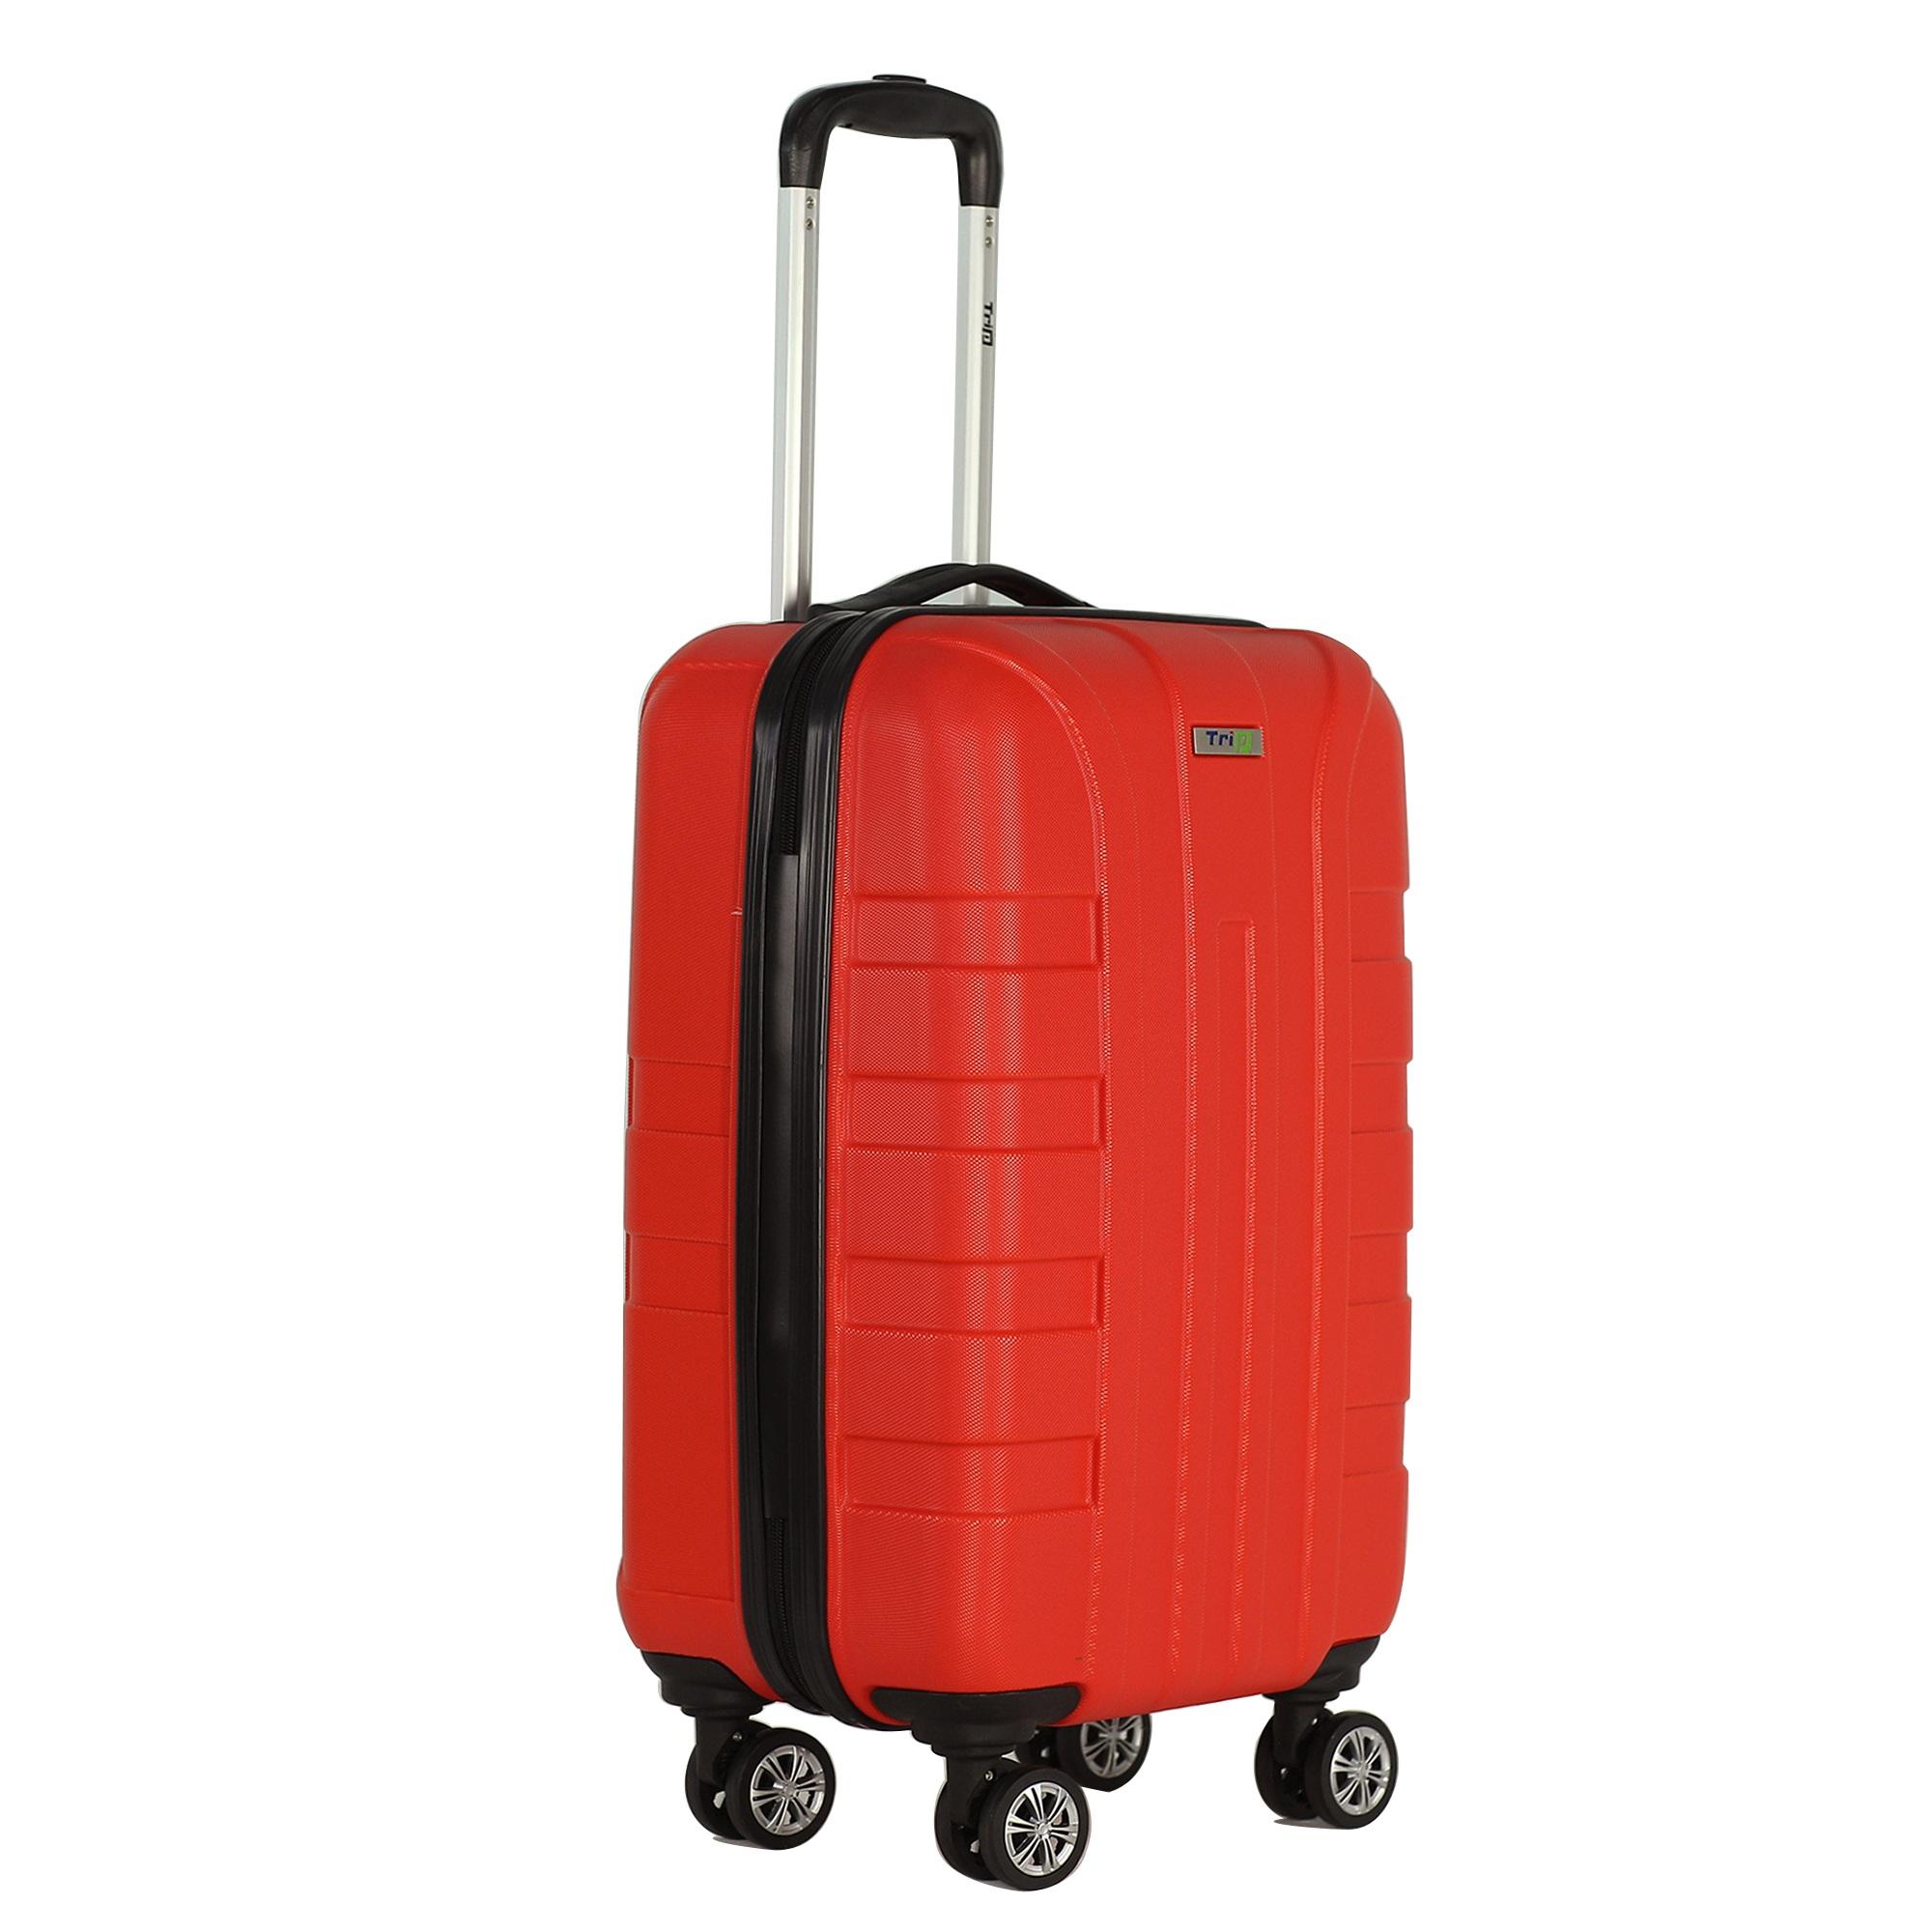 Vali Trip P12 size 50cm (20 inches) đỏ